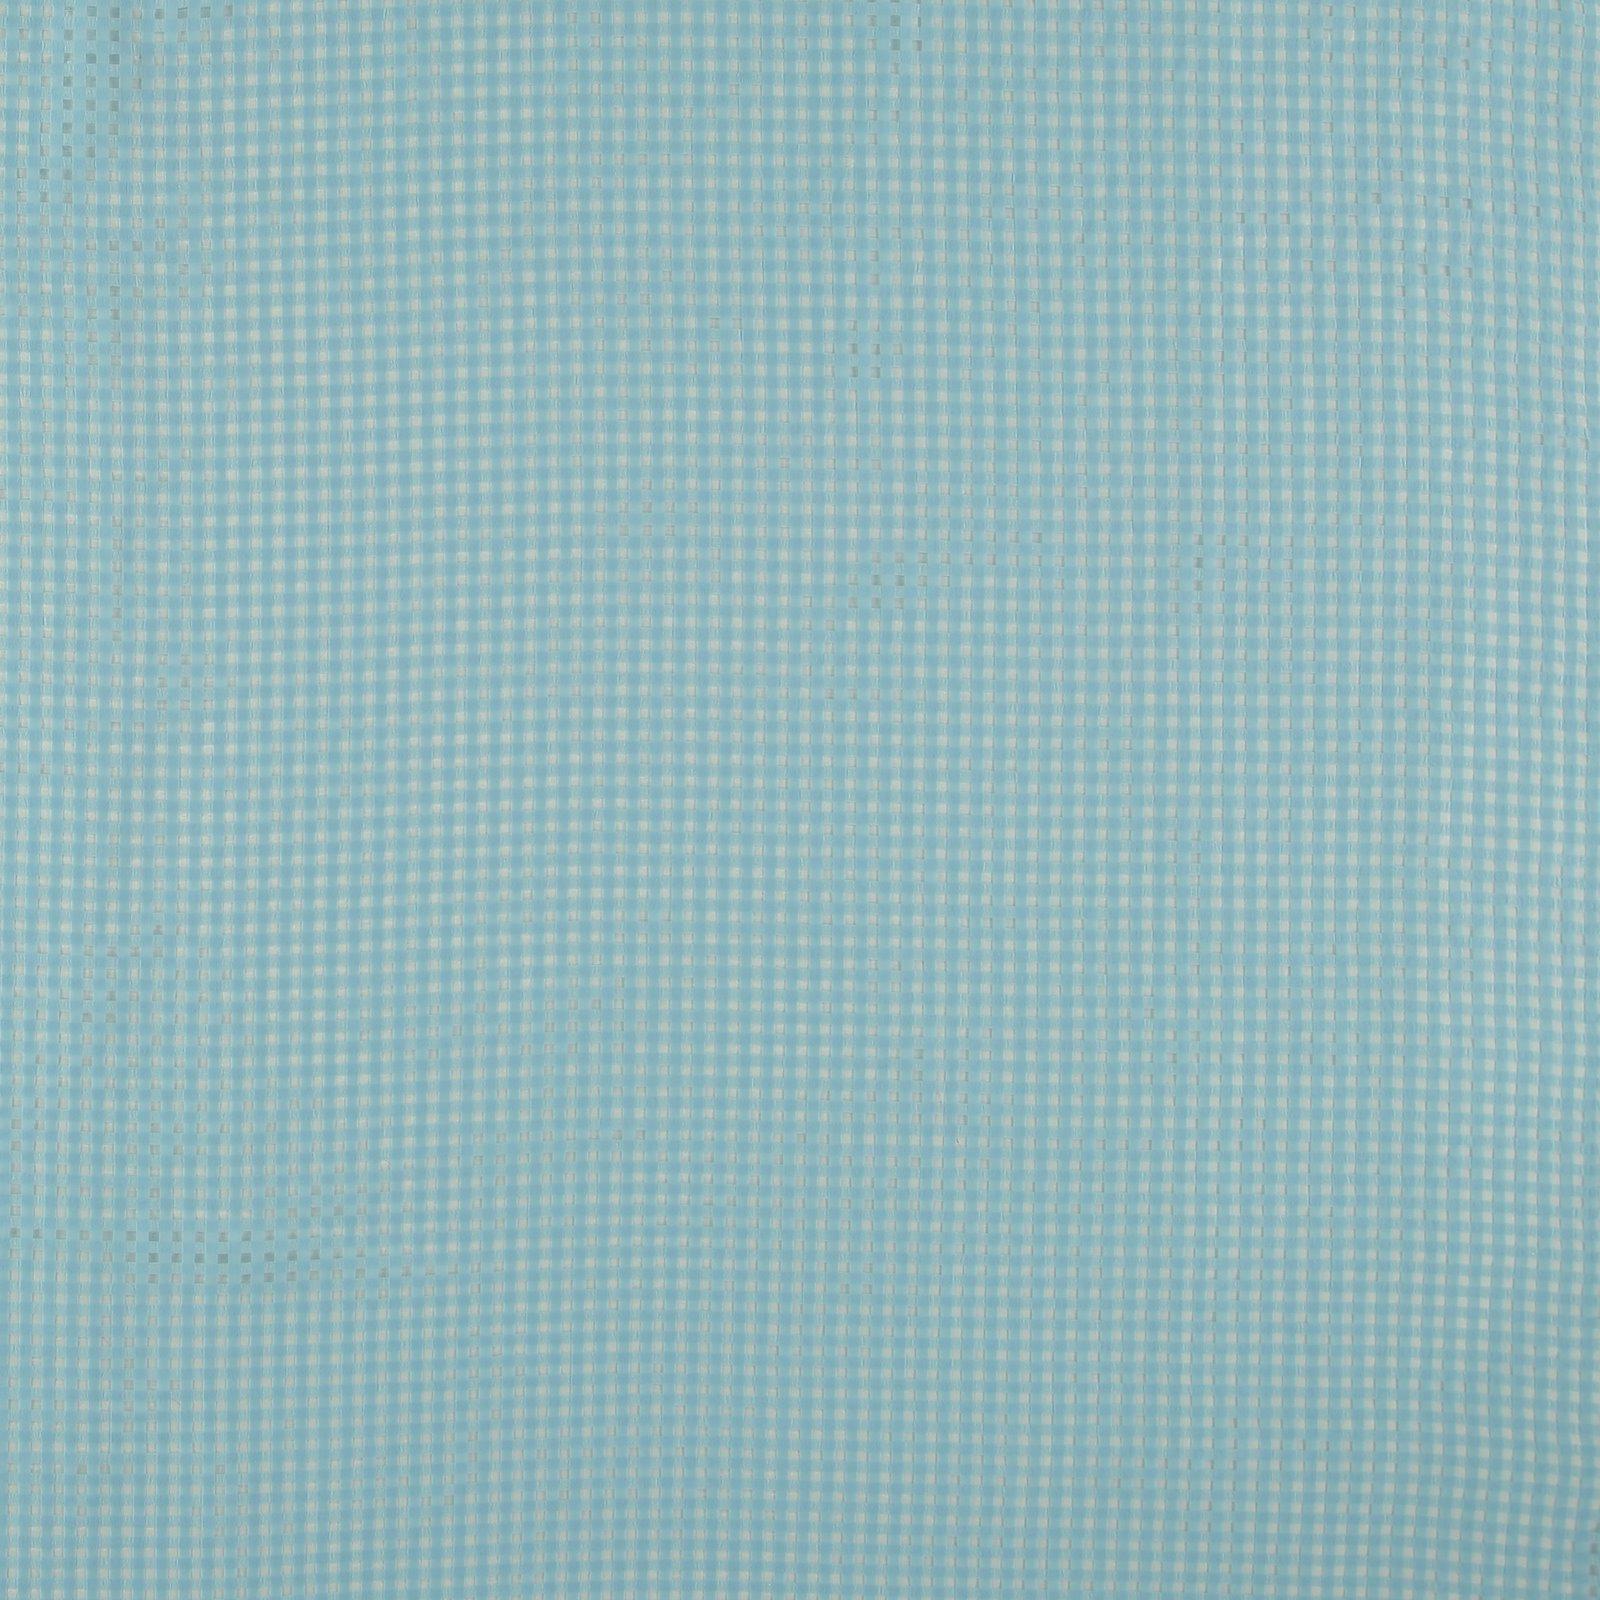 Organza light blue check 631260_pack_sp